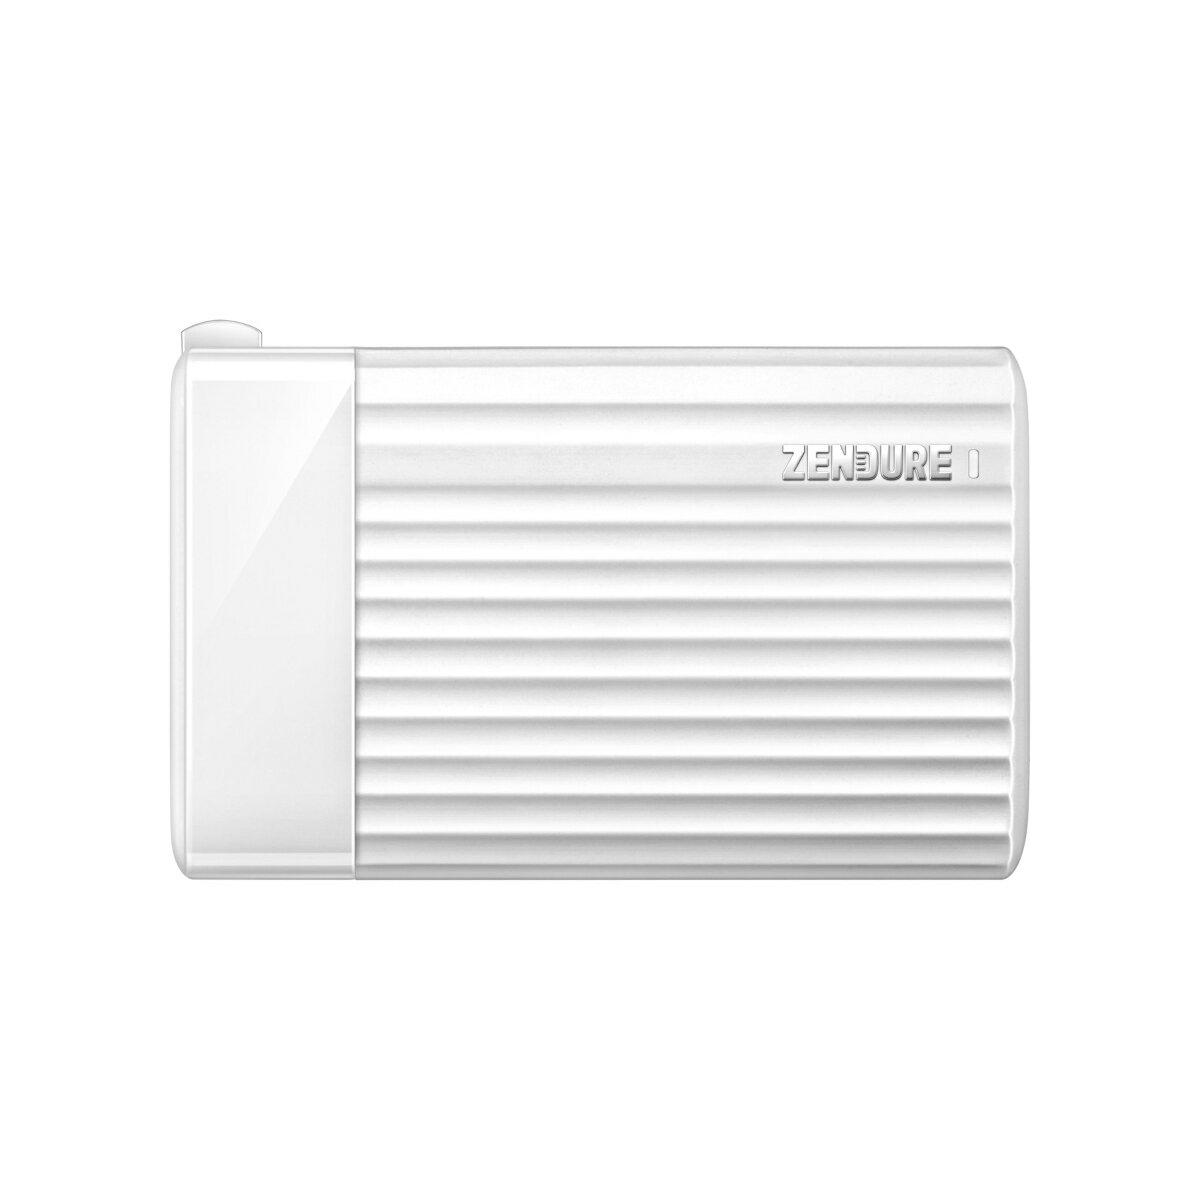 SuperPort S3 ホワイト 65W壁挿し充電器 USB 3ポート搭載